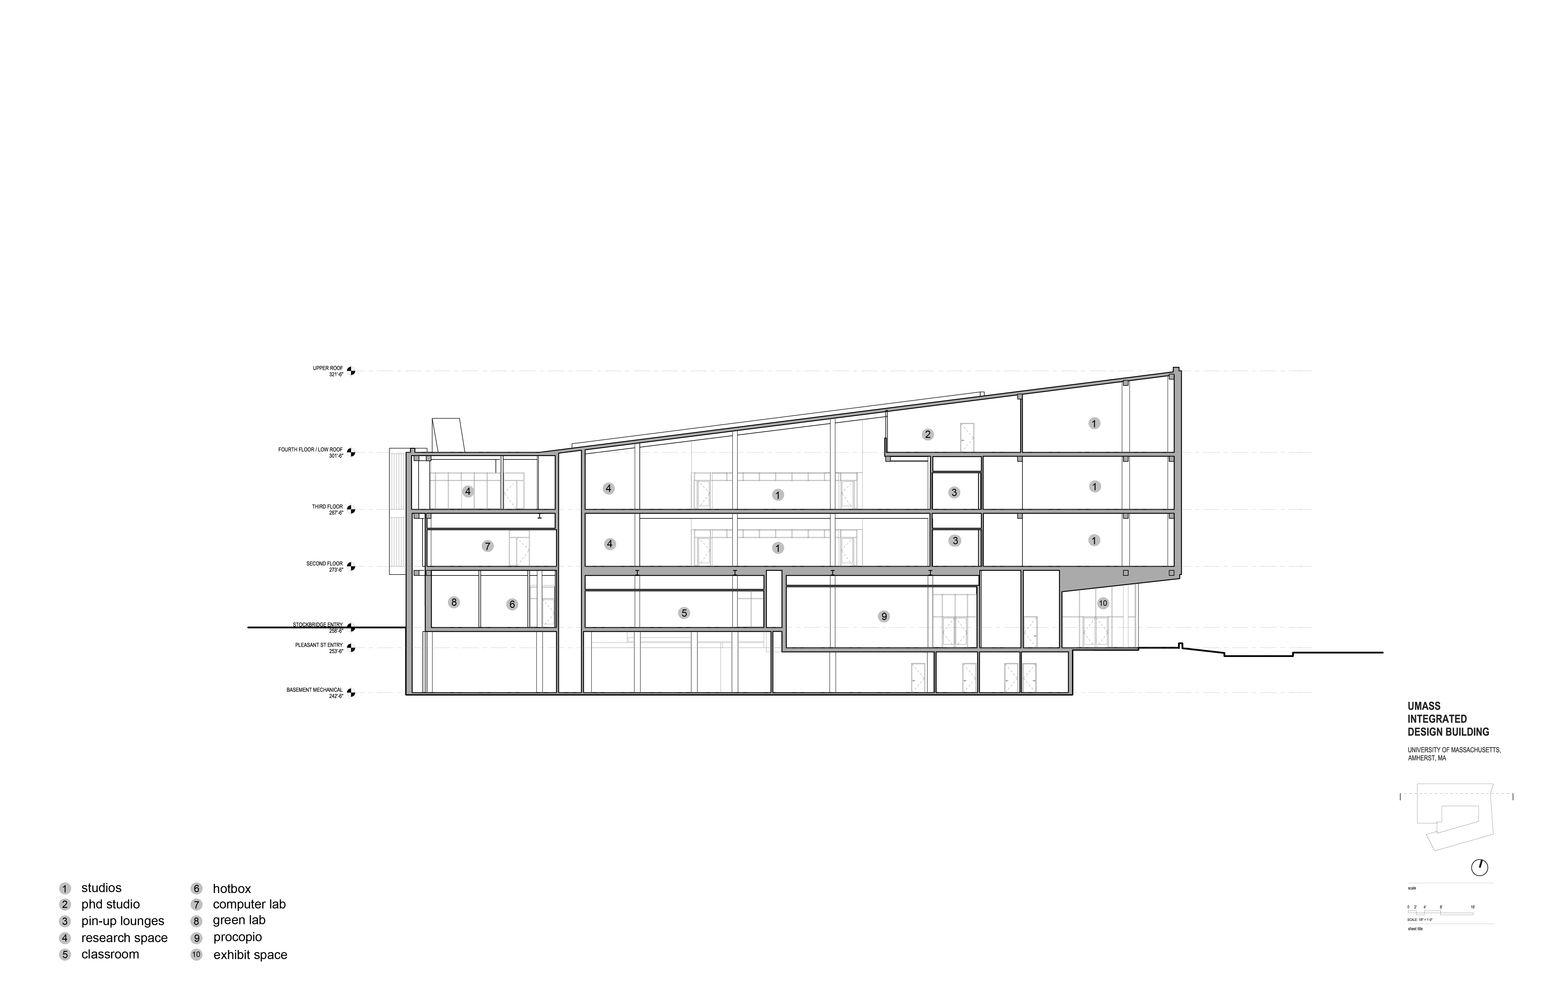 Gallery Of University Of Massachusetts Amherst Design Building